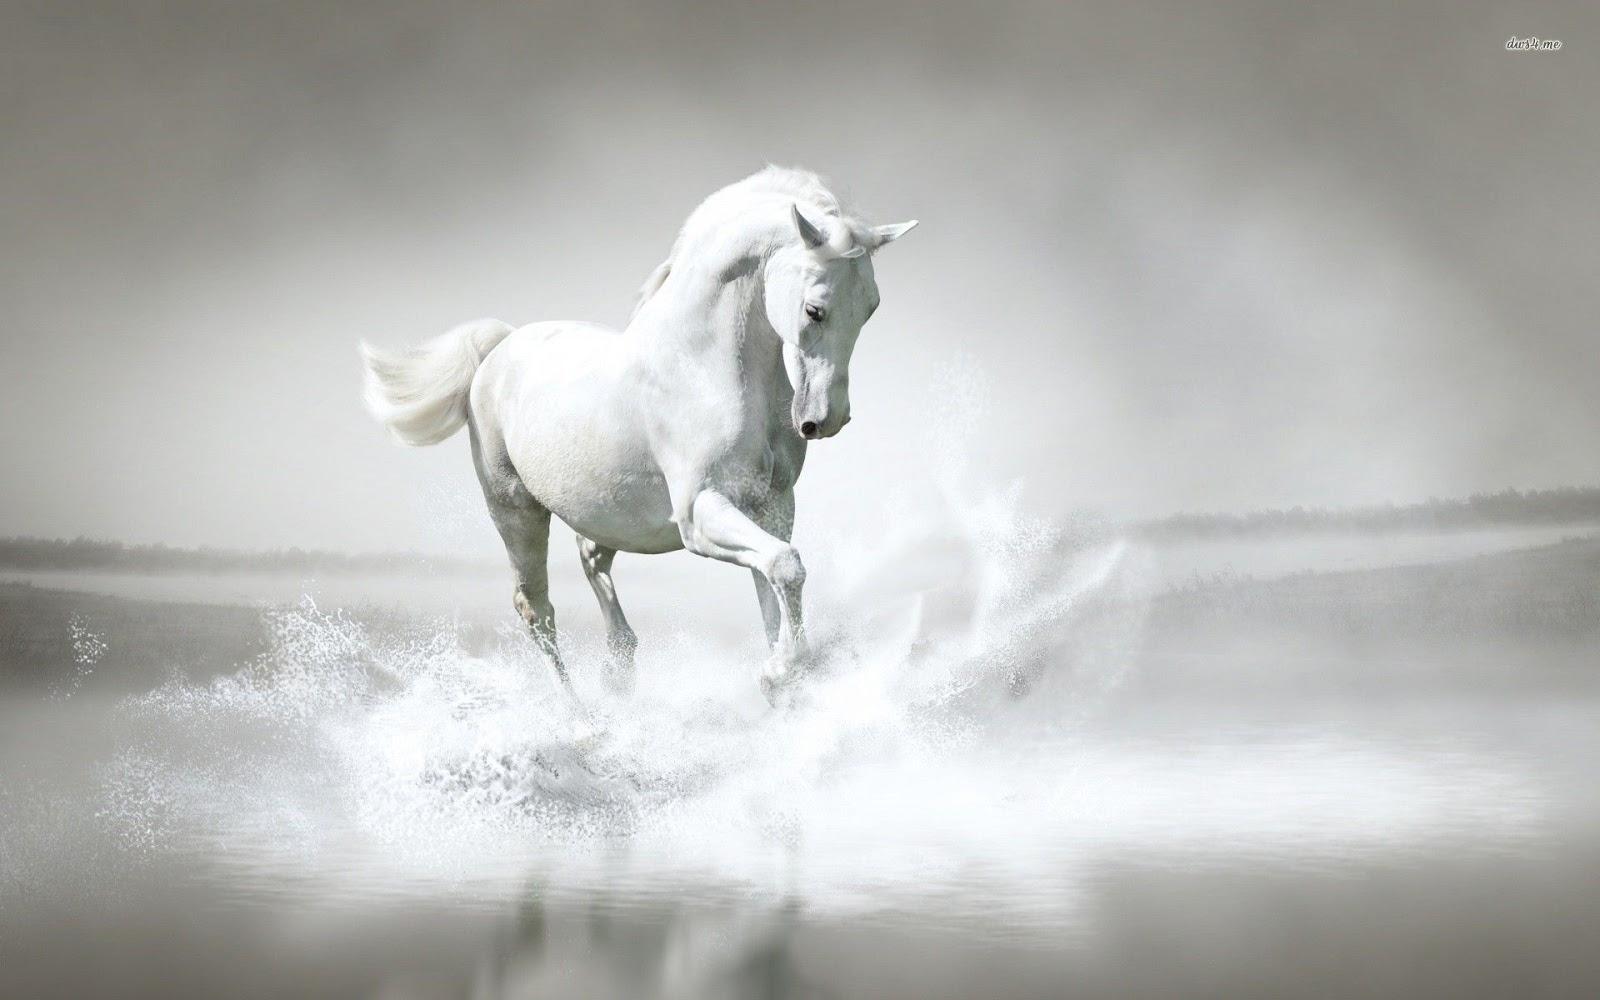 White Horse Hd Phtos Letest Wallpaper Hd Wallpaper